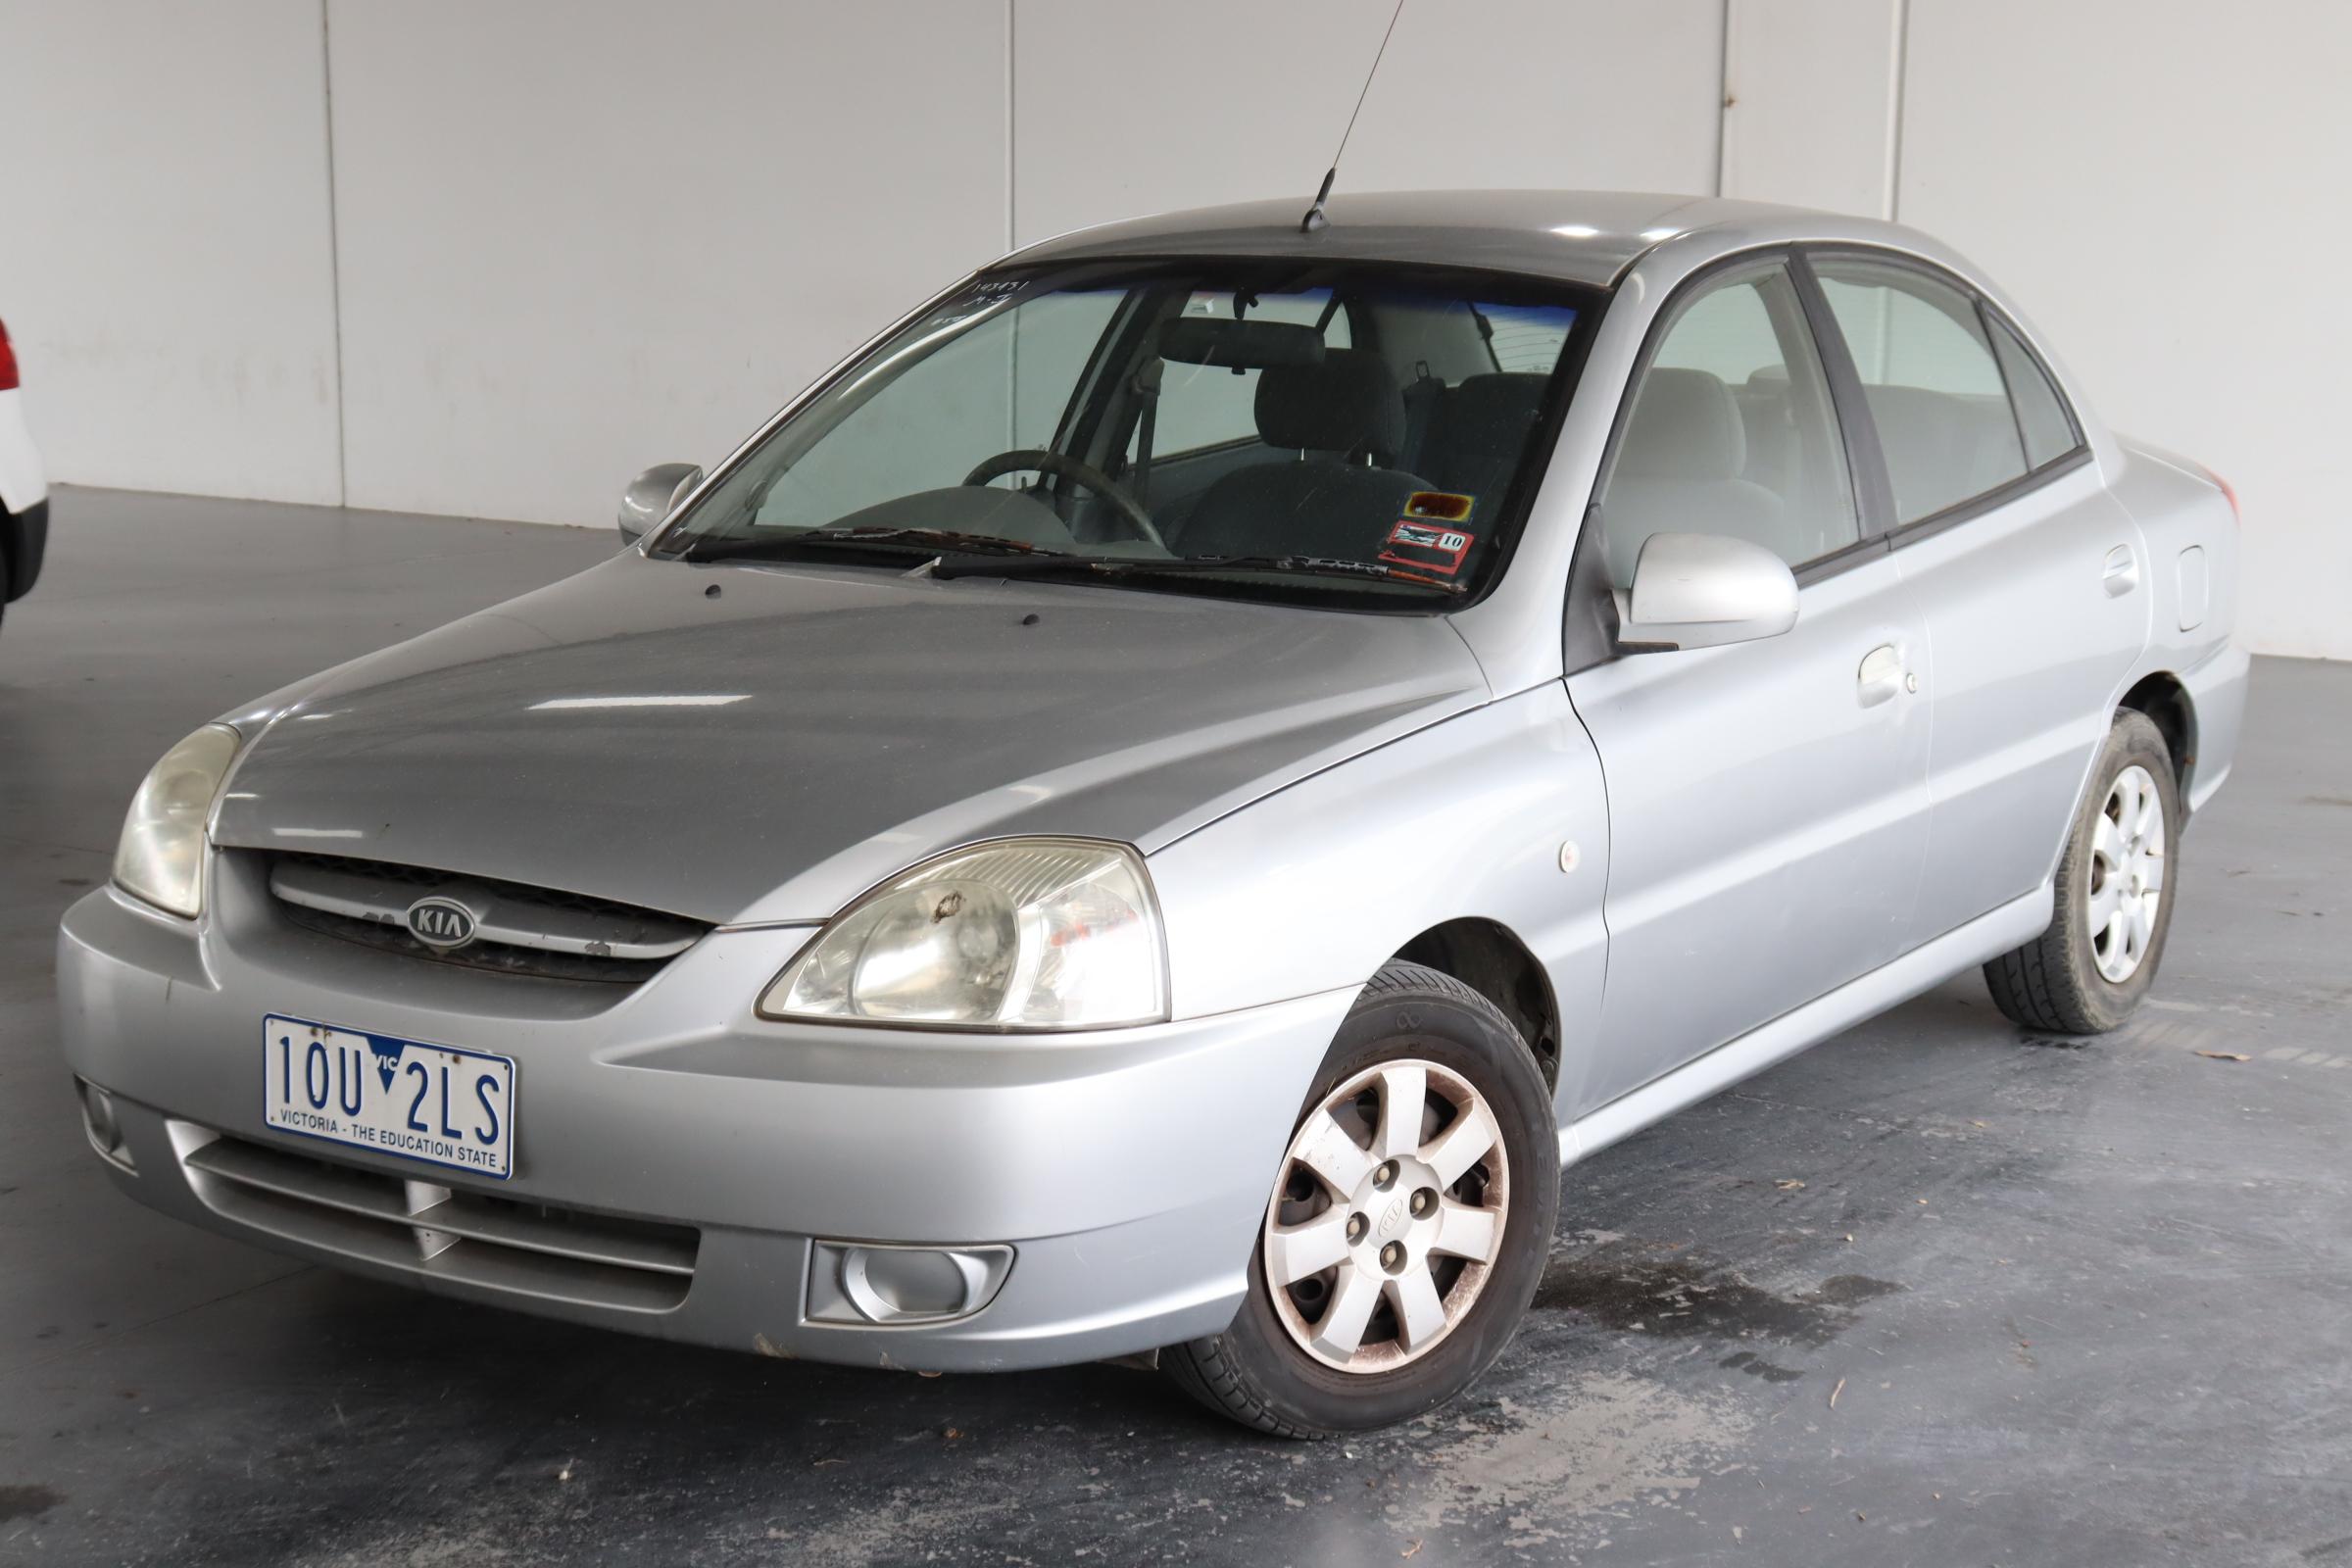 2003 Kia Rio BC Automatic Sedan (WOVR Inspected)